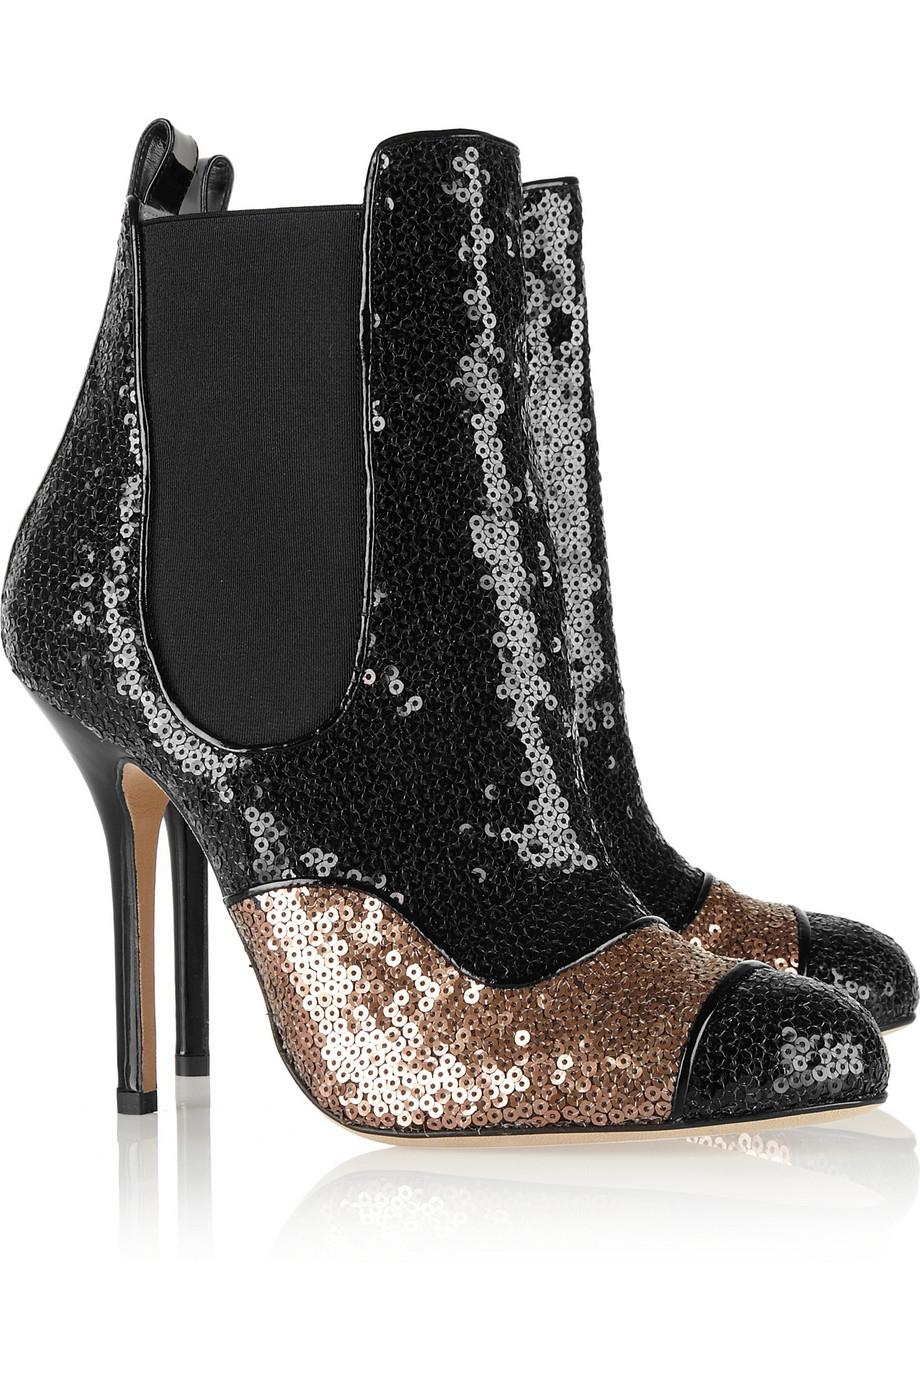 Oscar de la Renta Lady Simona Sequined Leather Boots in Black